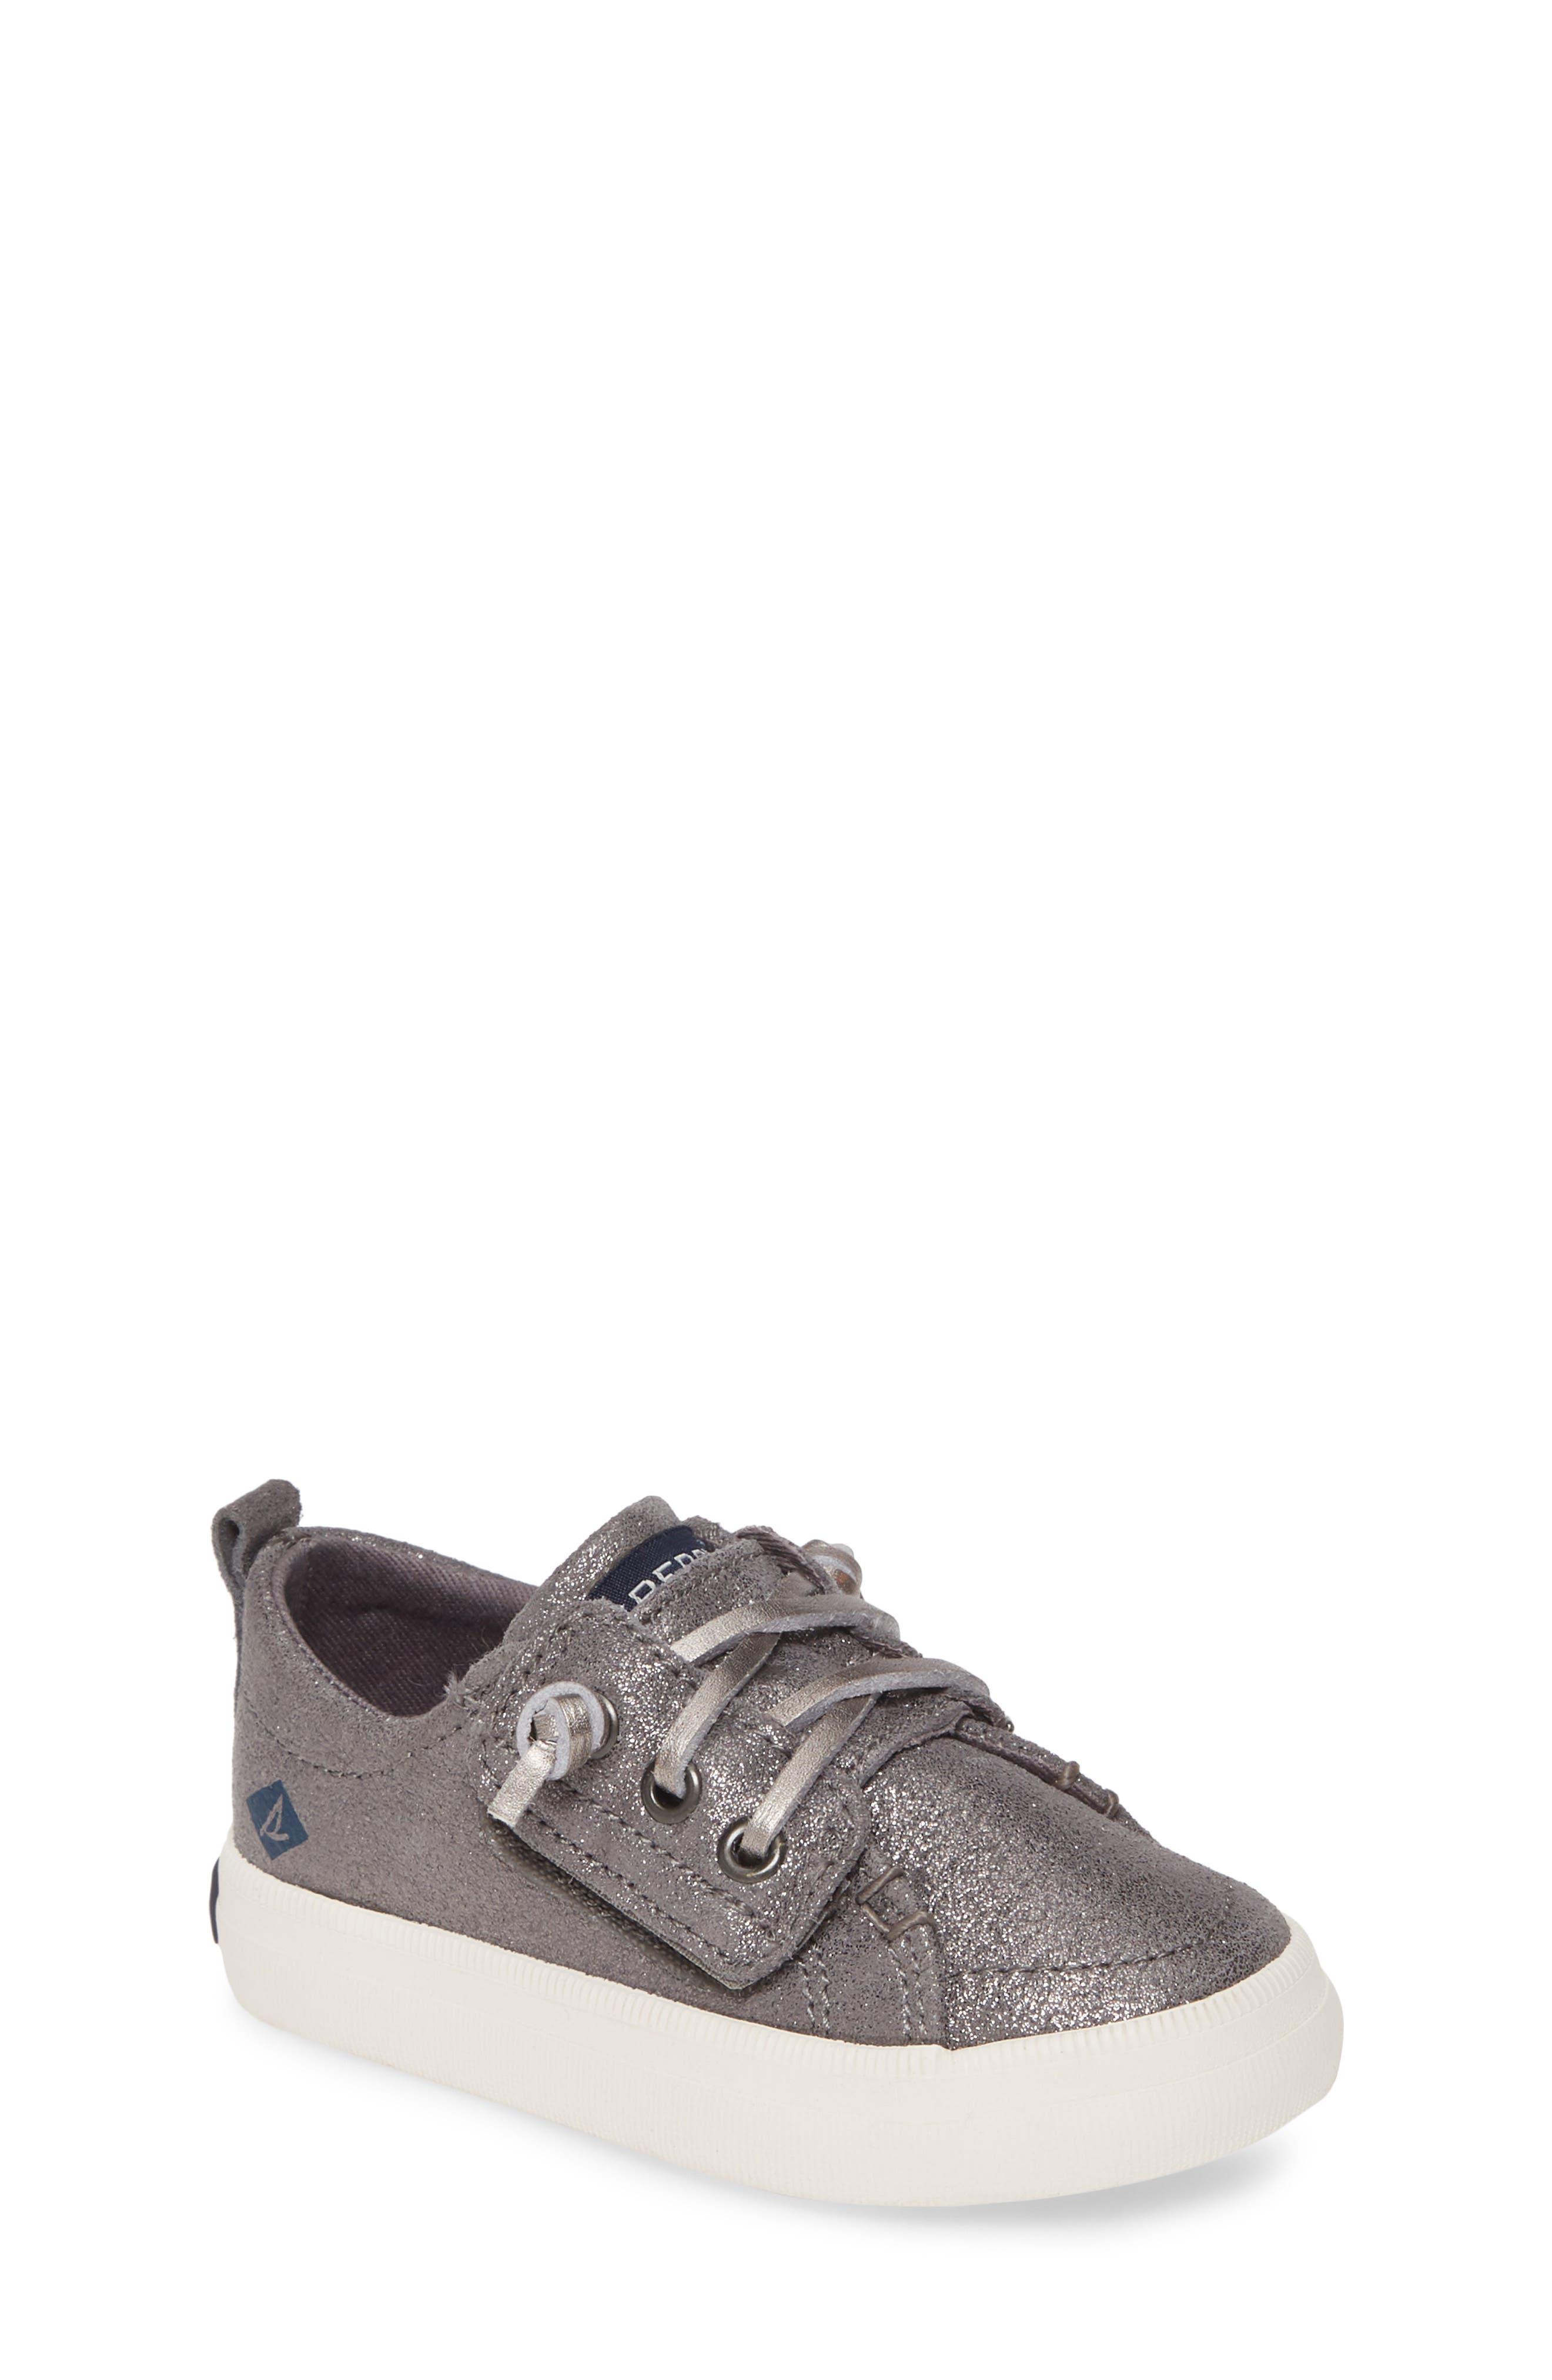 Girls Sperry Crest Vibe Sneaker Size 1 M  Metallic